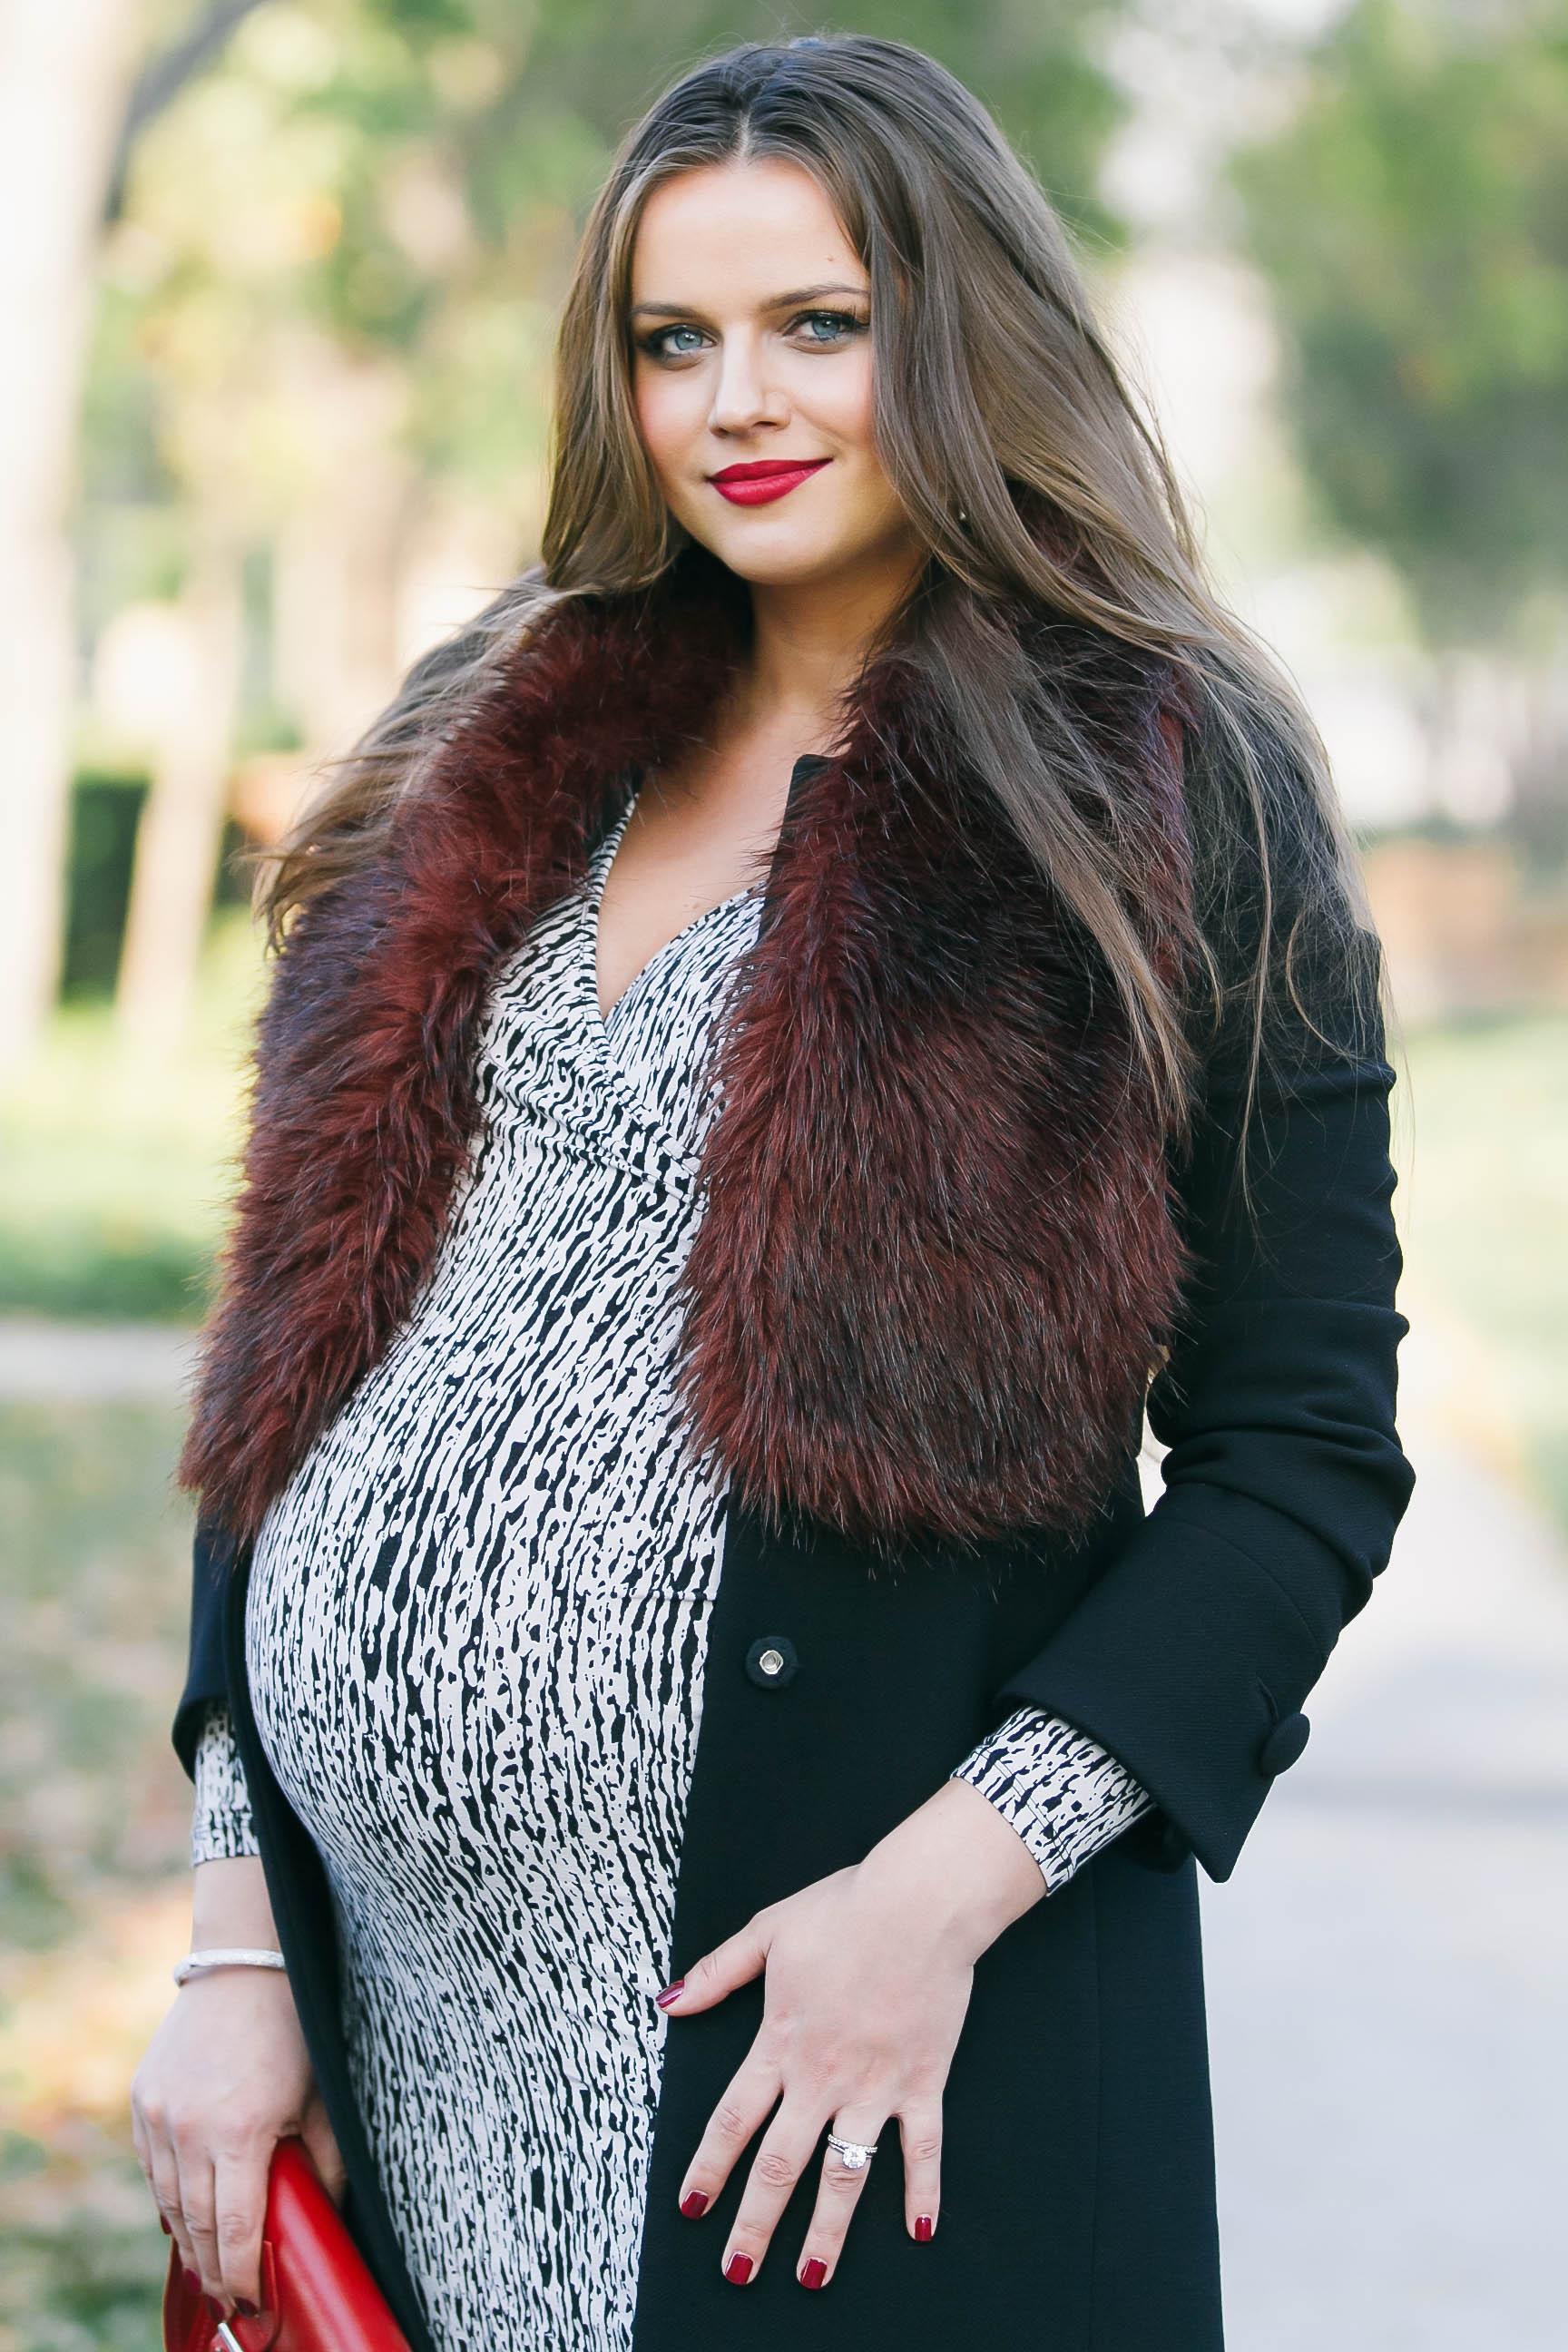 BumpStyle  Fitted Coat  Faux Fur Stole  BondGirlGlamcom  A Fashion Baby Gear Beauty